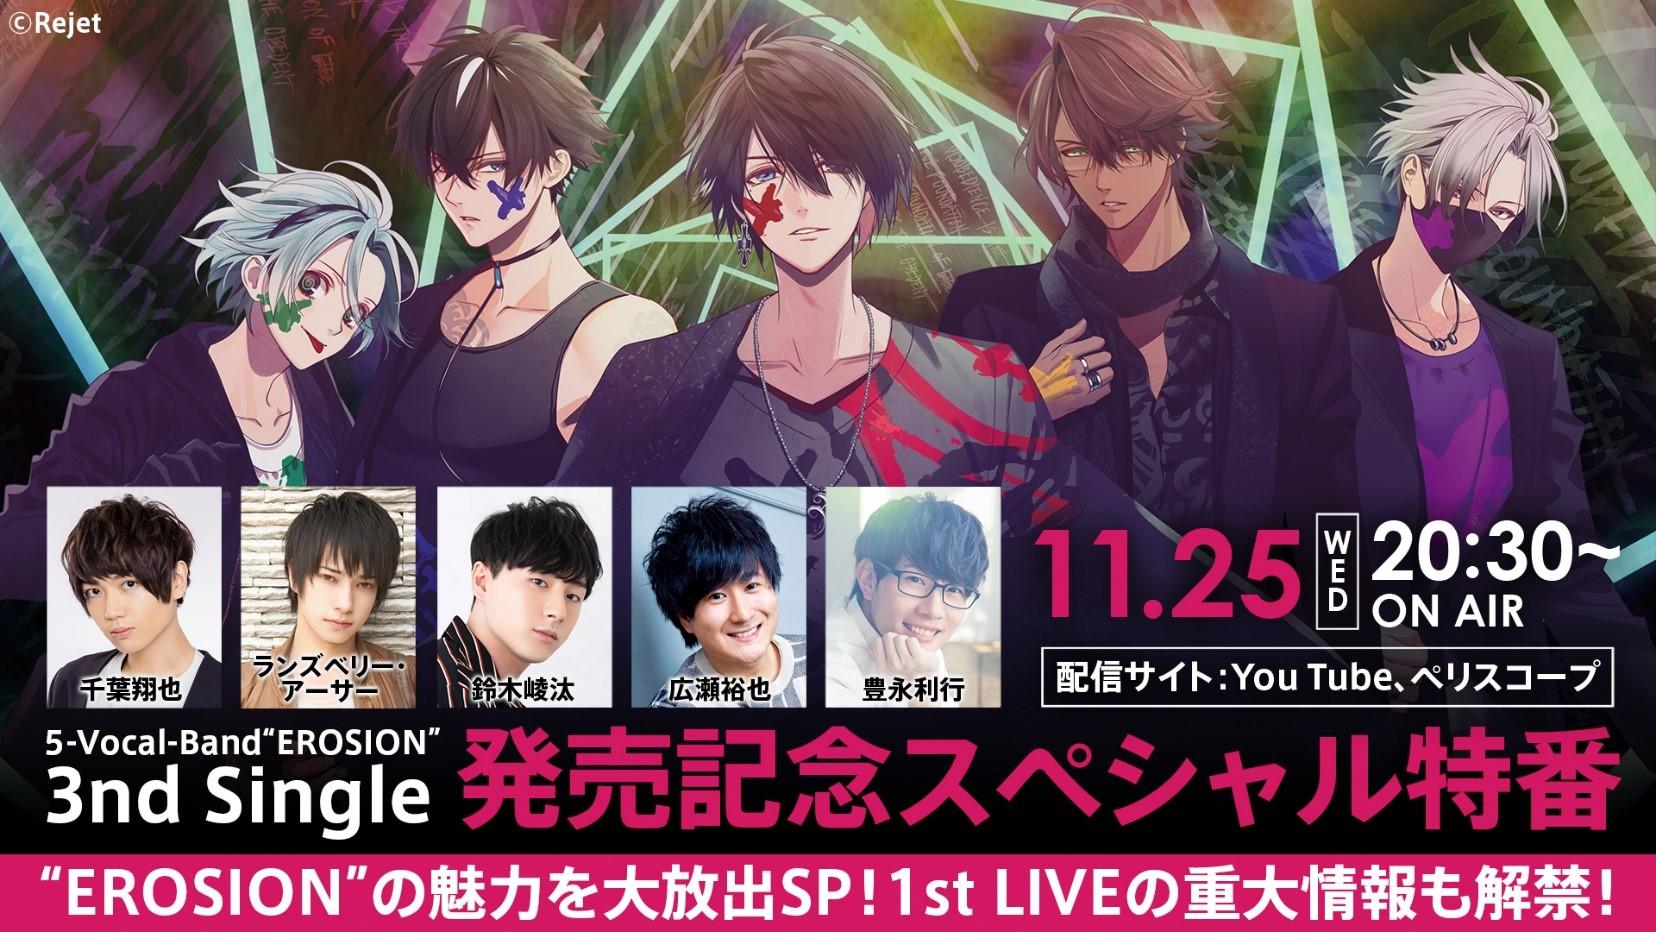 "「CARNELIAN BLOOD」5-Vocal-Band""EROSION""3rd Single 発売記念スペシャル特番"